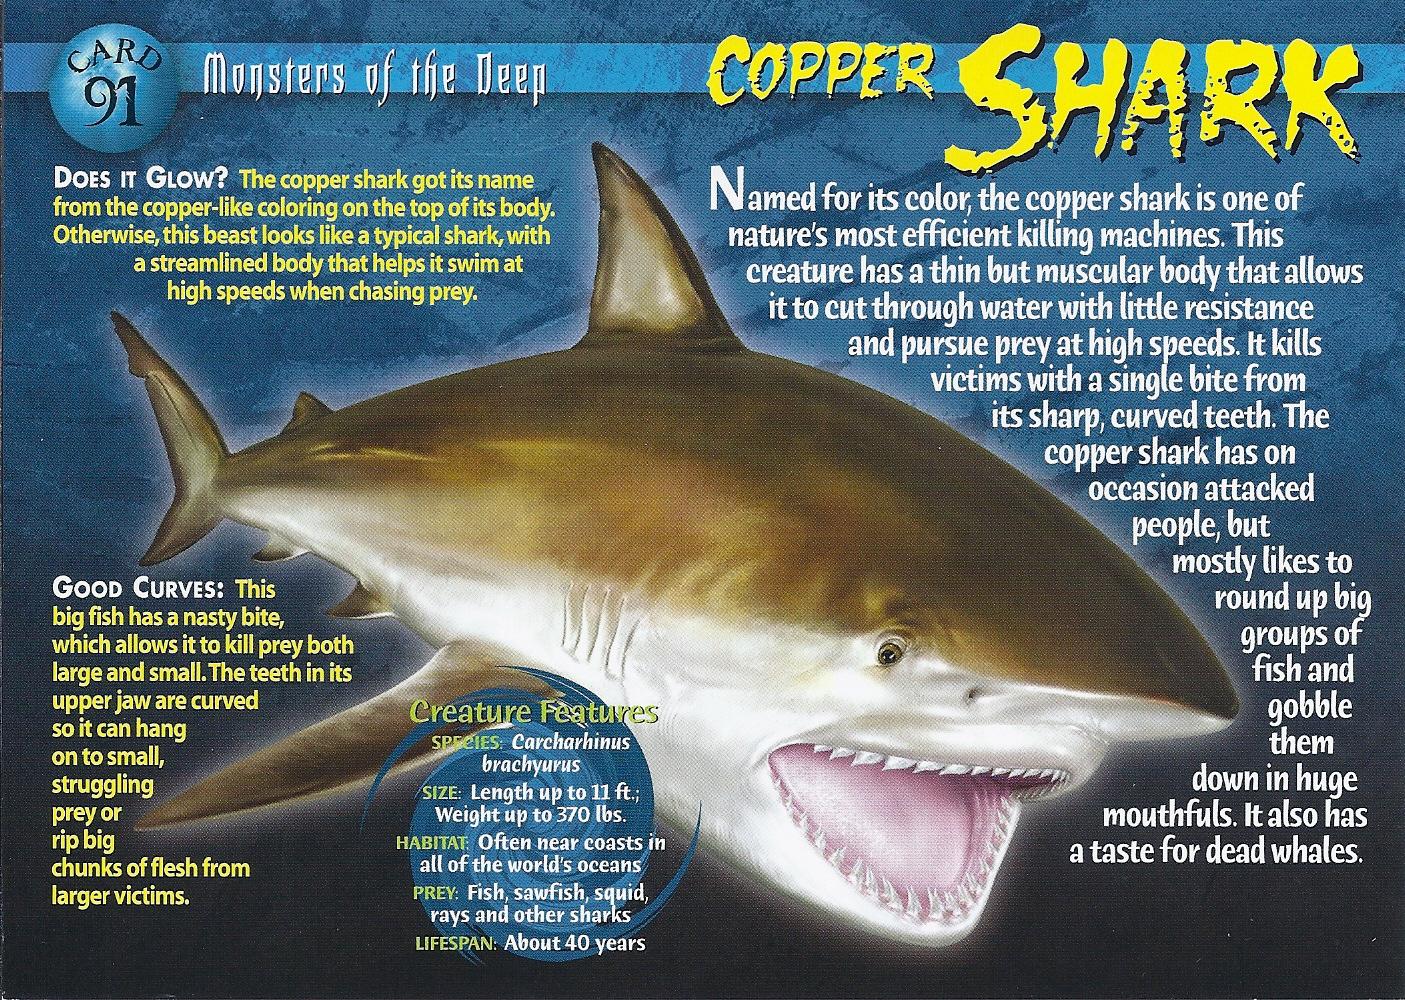 Cookie cutter shark human attack - Animal Kid for Cookie Cutter Shark Human Attack  166kxo